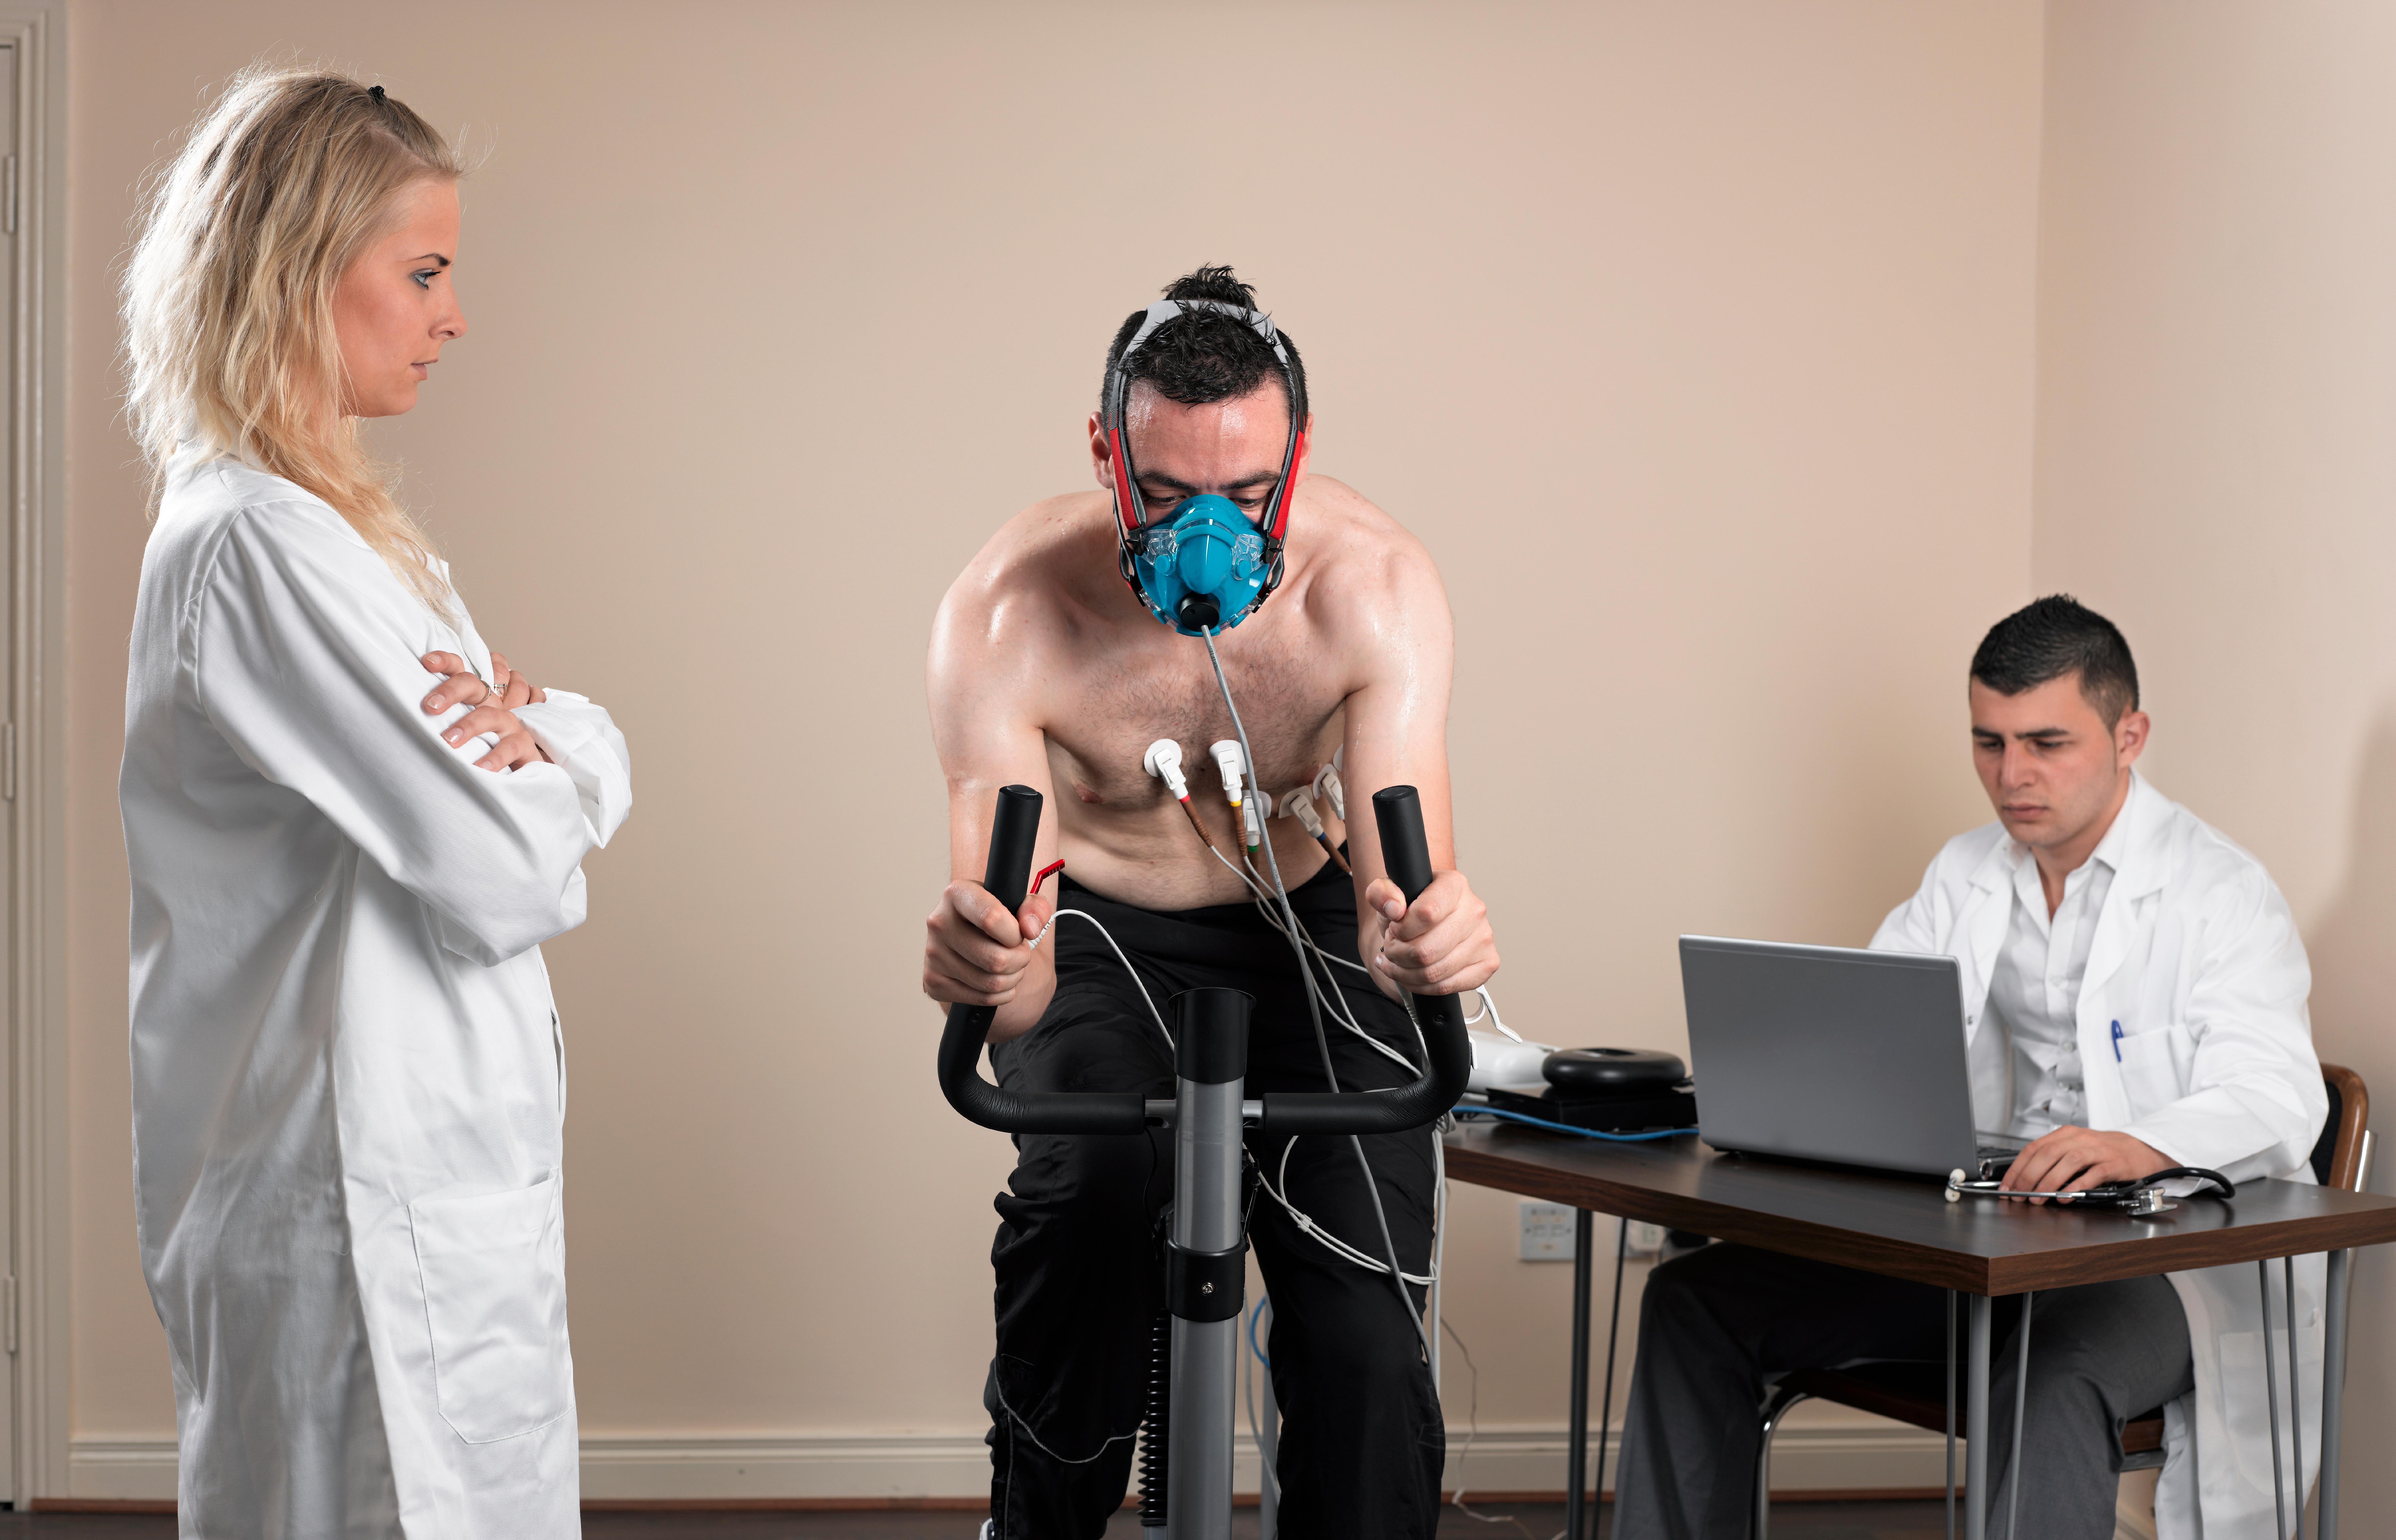 How Much Does An EKG Technician Make Hour